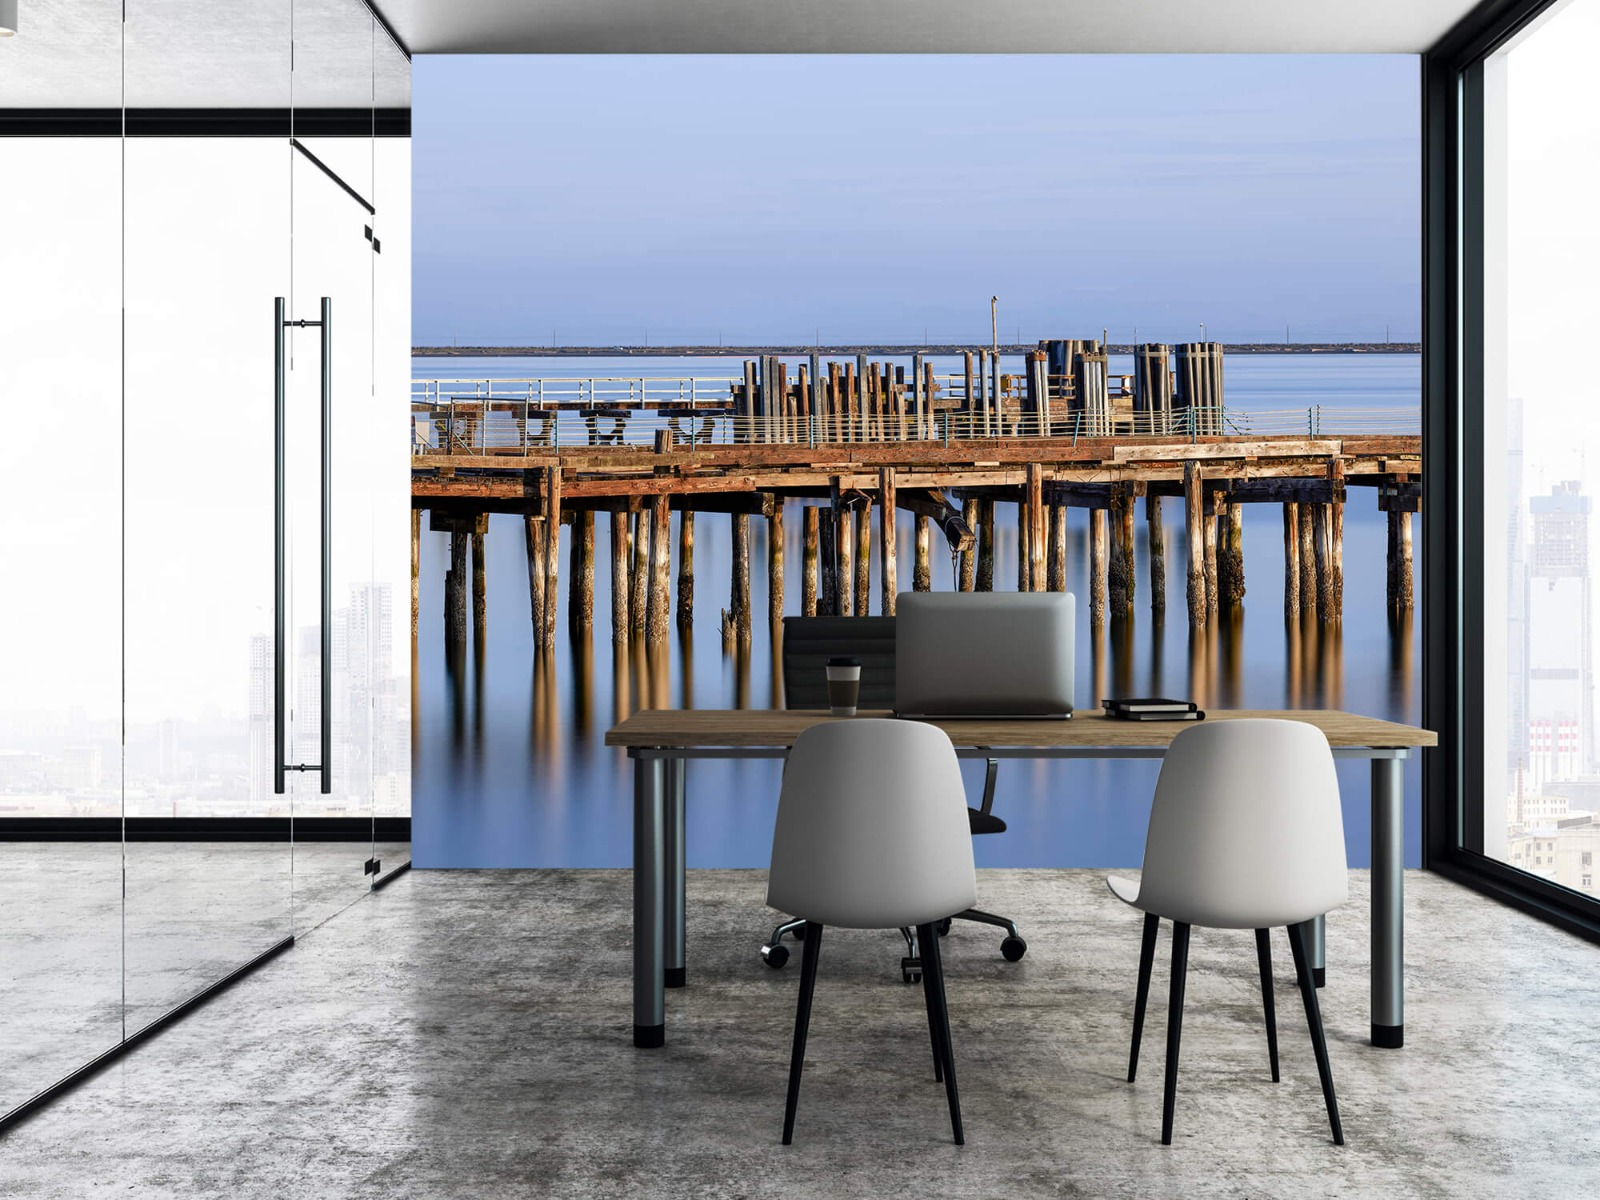 Houten Steigers - Steiger op houten palen - Wallexclusive - Slaapkamer 4